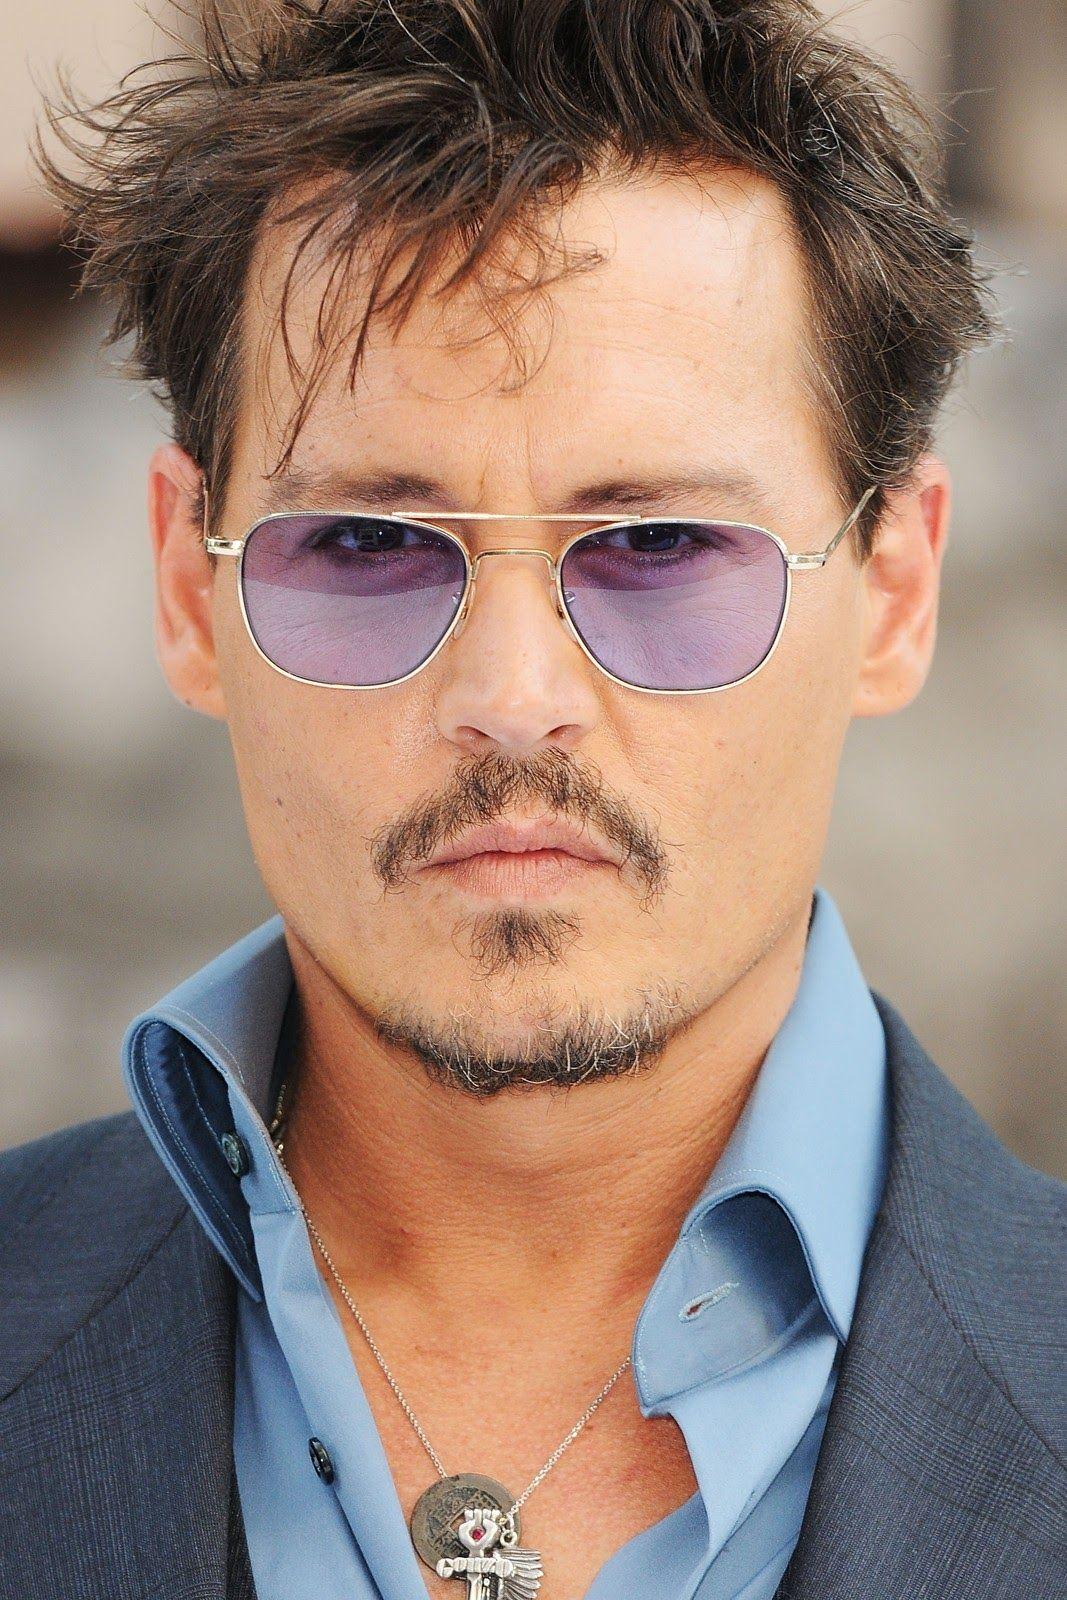 Depp Sexy New Look 2013  Hottest Actors Photo (35238860